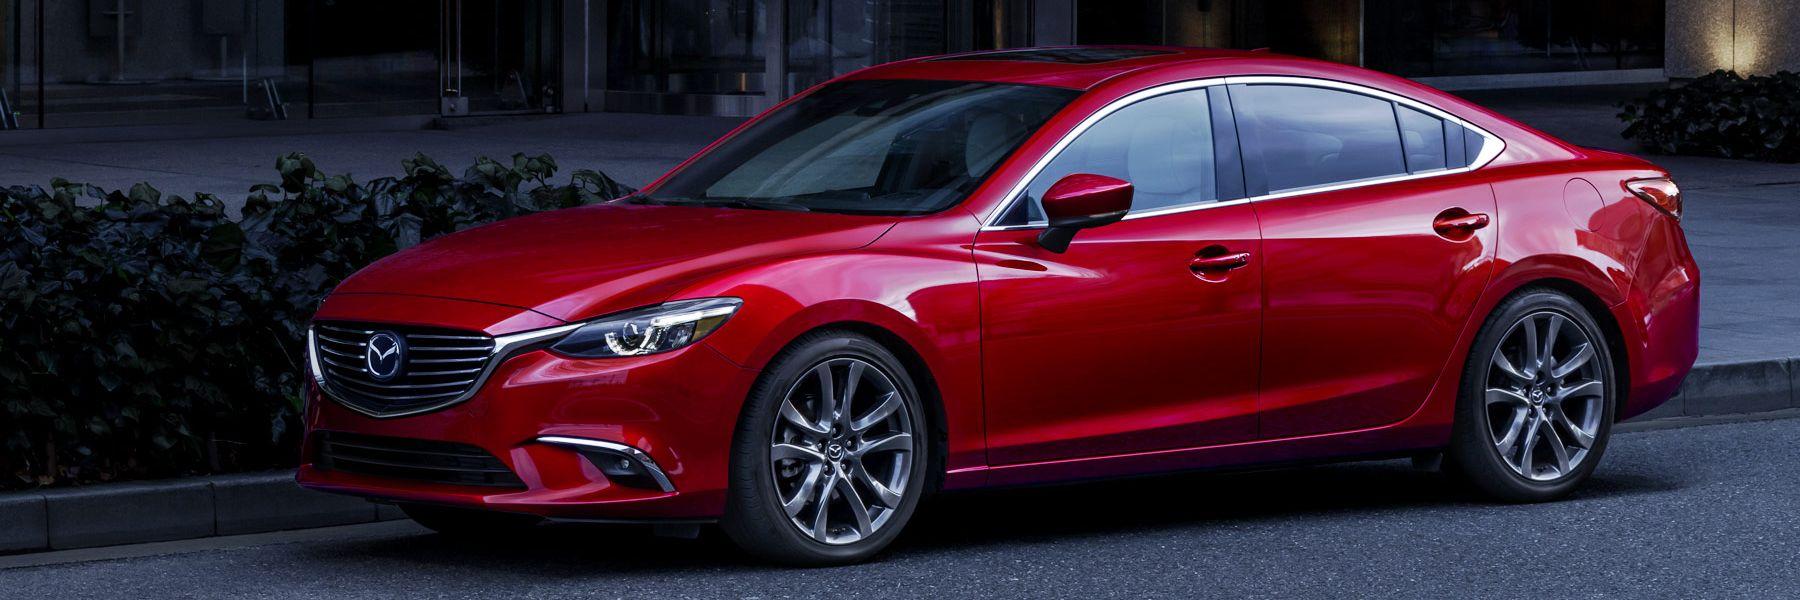 2017 Mazda6 for Sale near Kalamazoo, MI - Basney Mazda